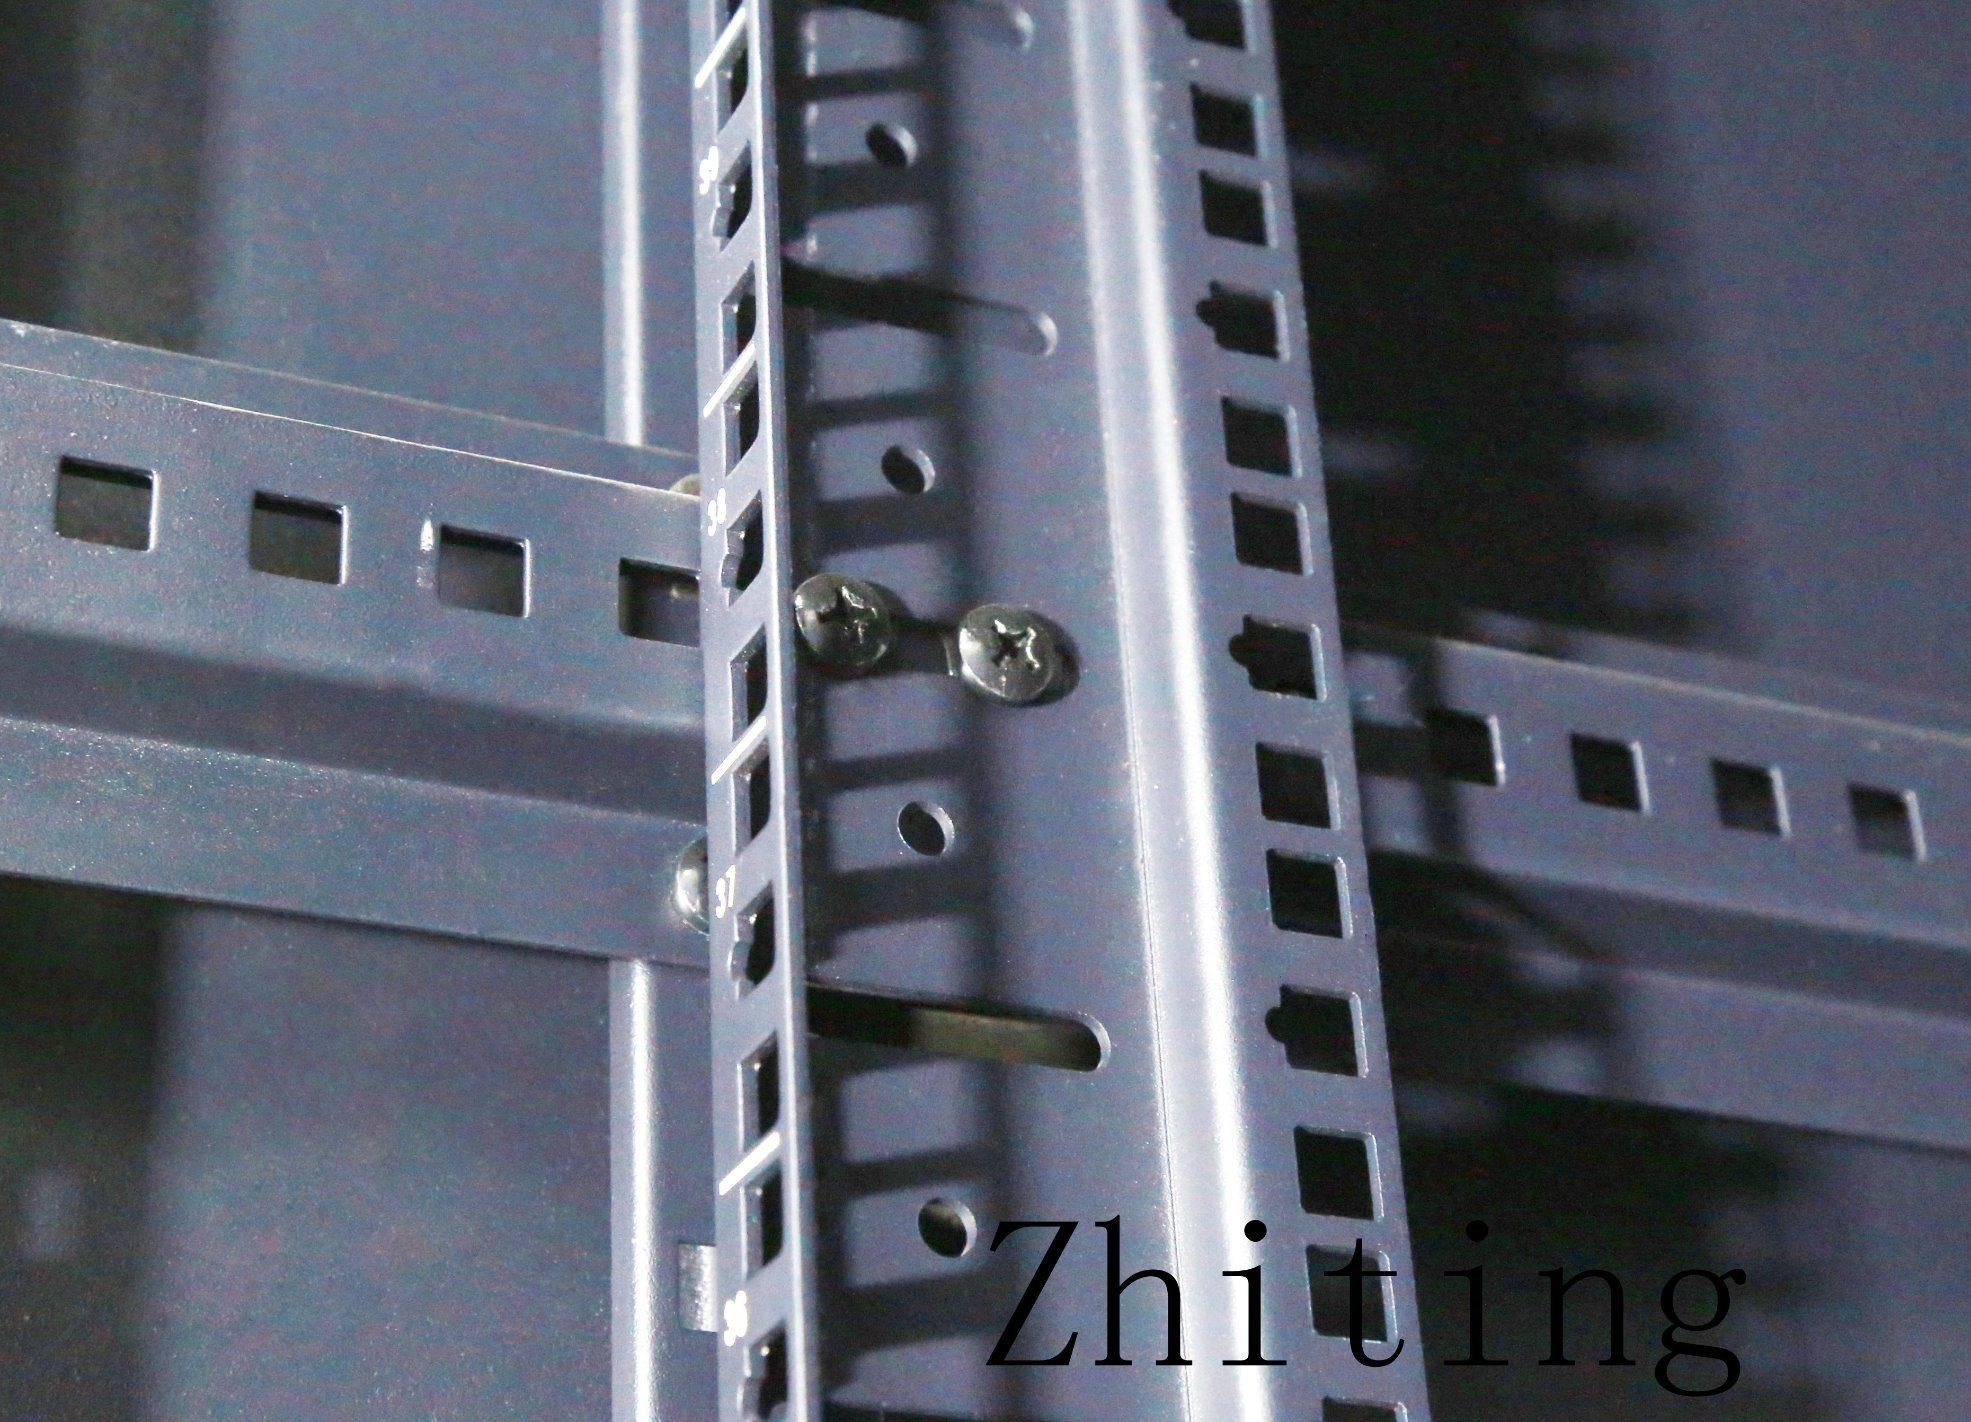 19 Inch Zt Ls Series Server Network Rack Used in Micro-Module